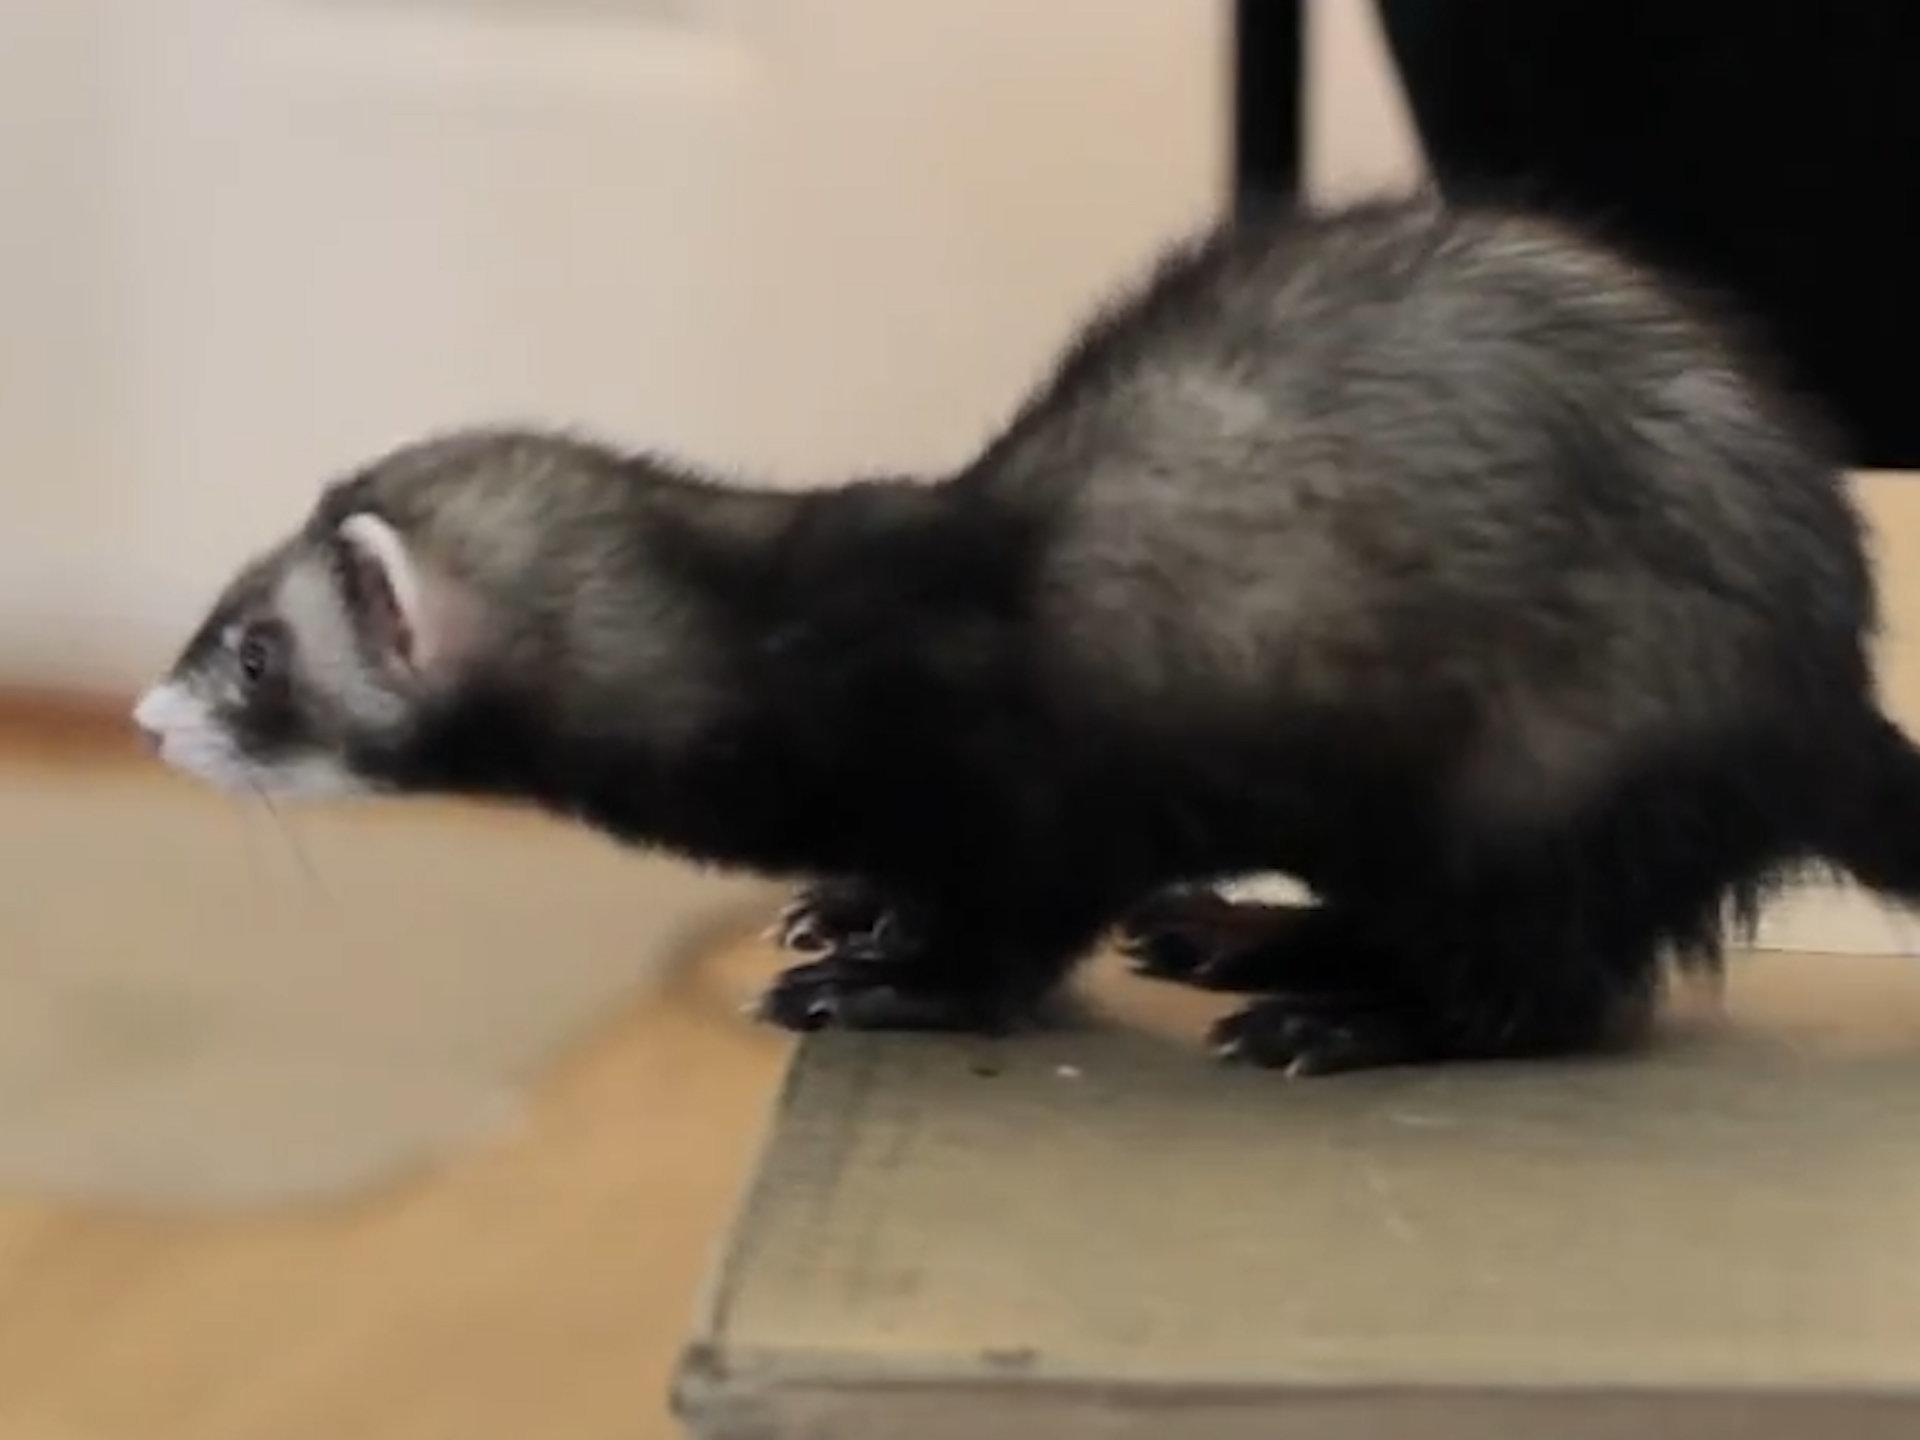 Ferret jump fails